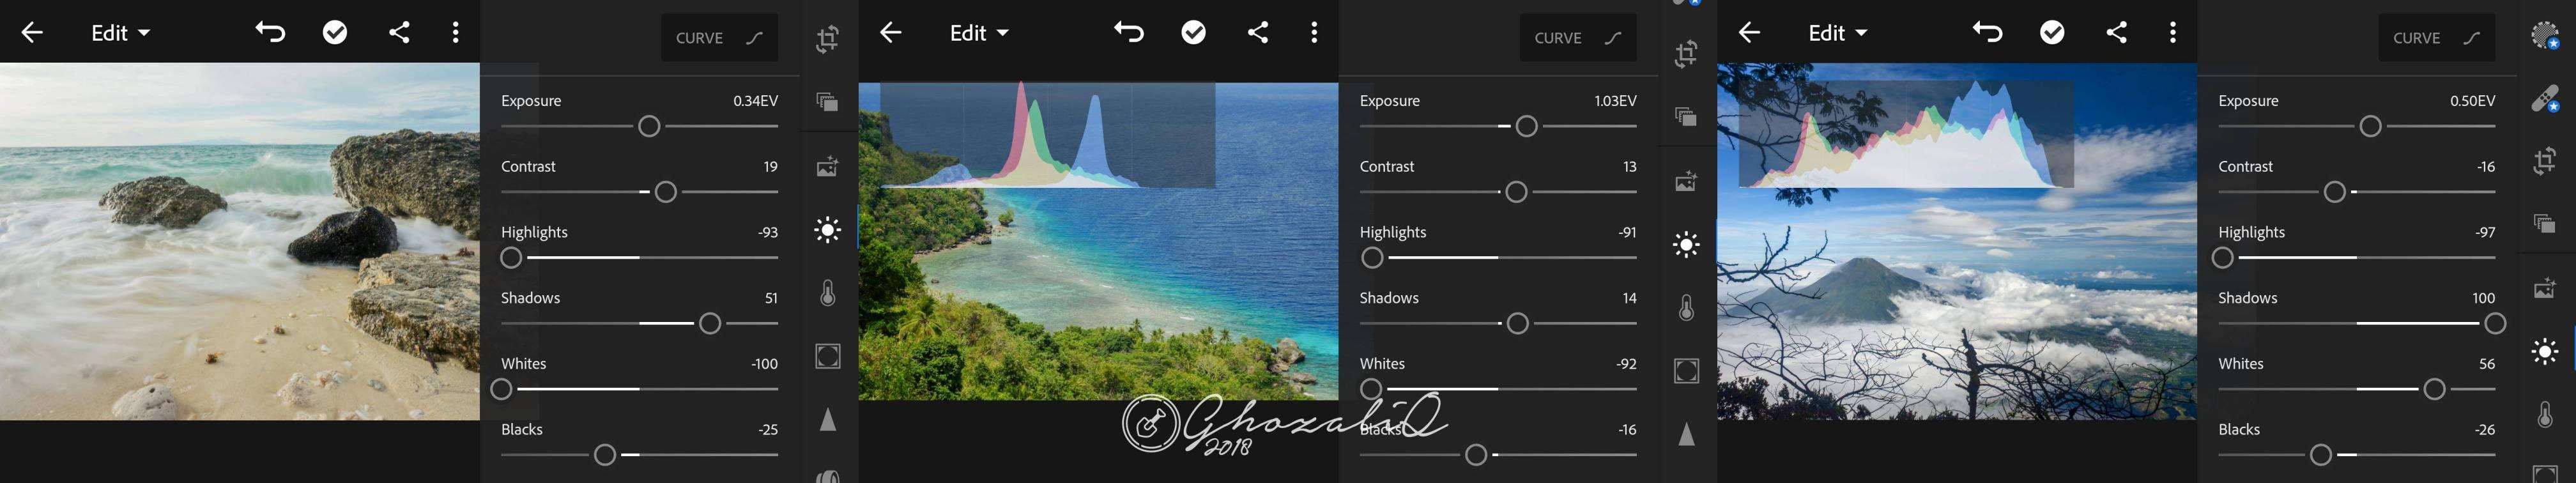 Edit foto landscape di lightroom android